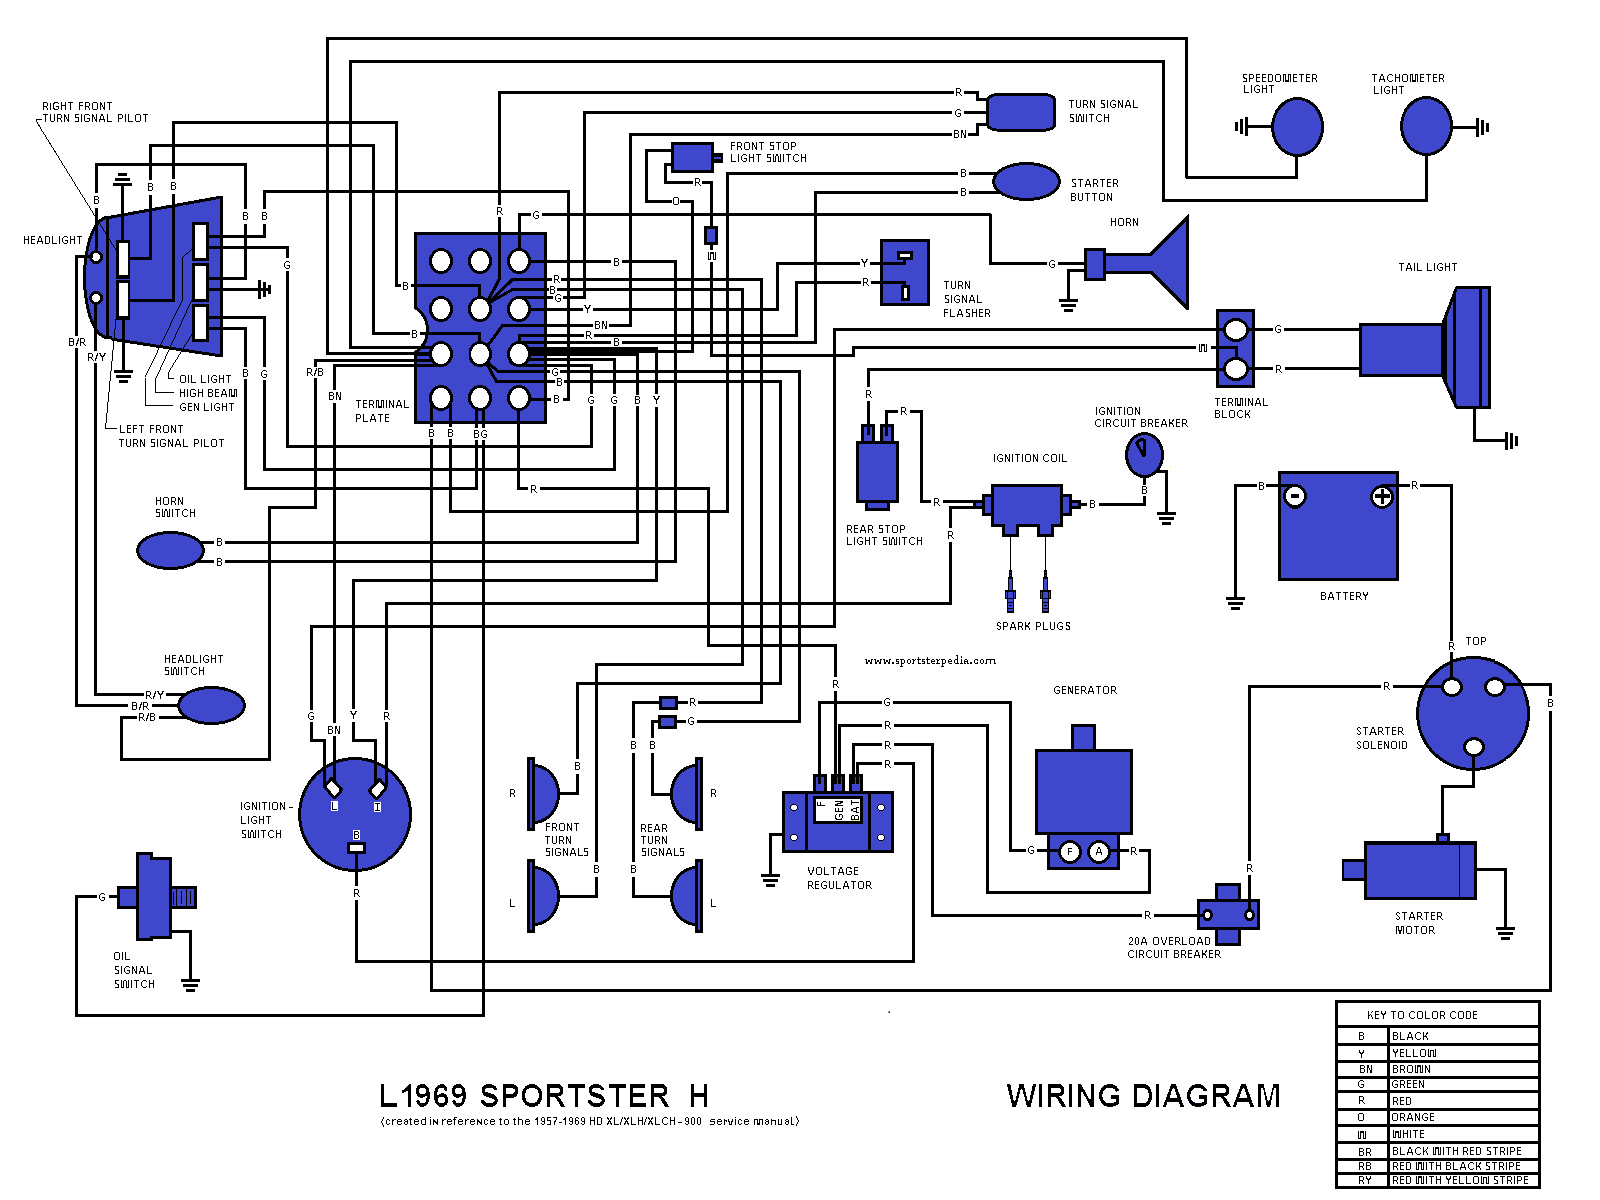 [TVPR_3874]  REF: Electrical System - Sportsterpedia | 1983 Sportster Wiring Diagram |  | Sportsterpedia